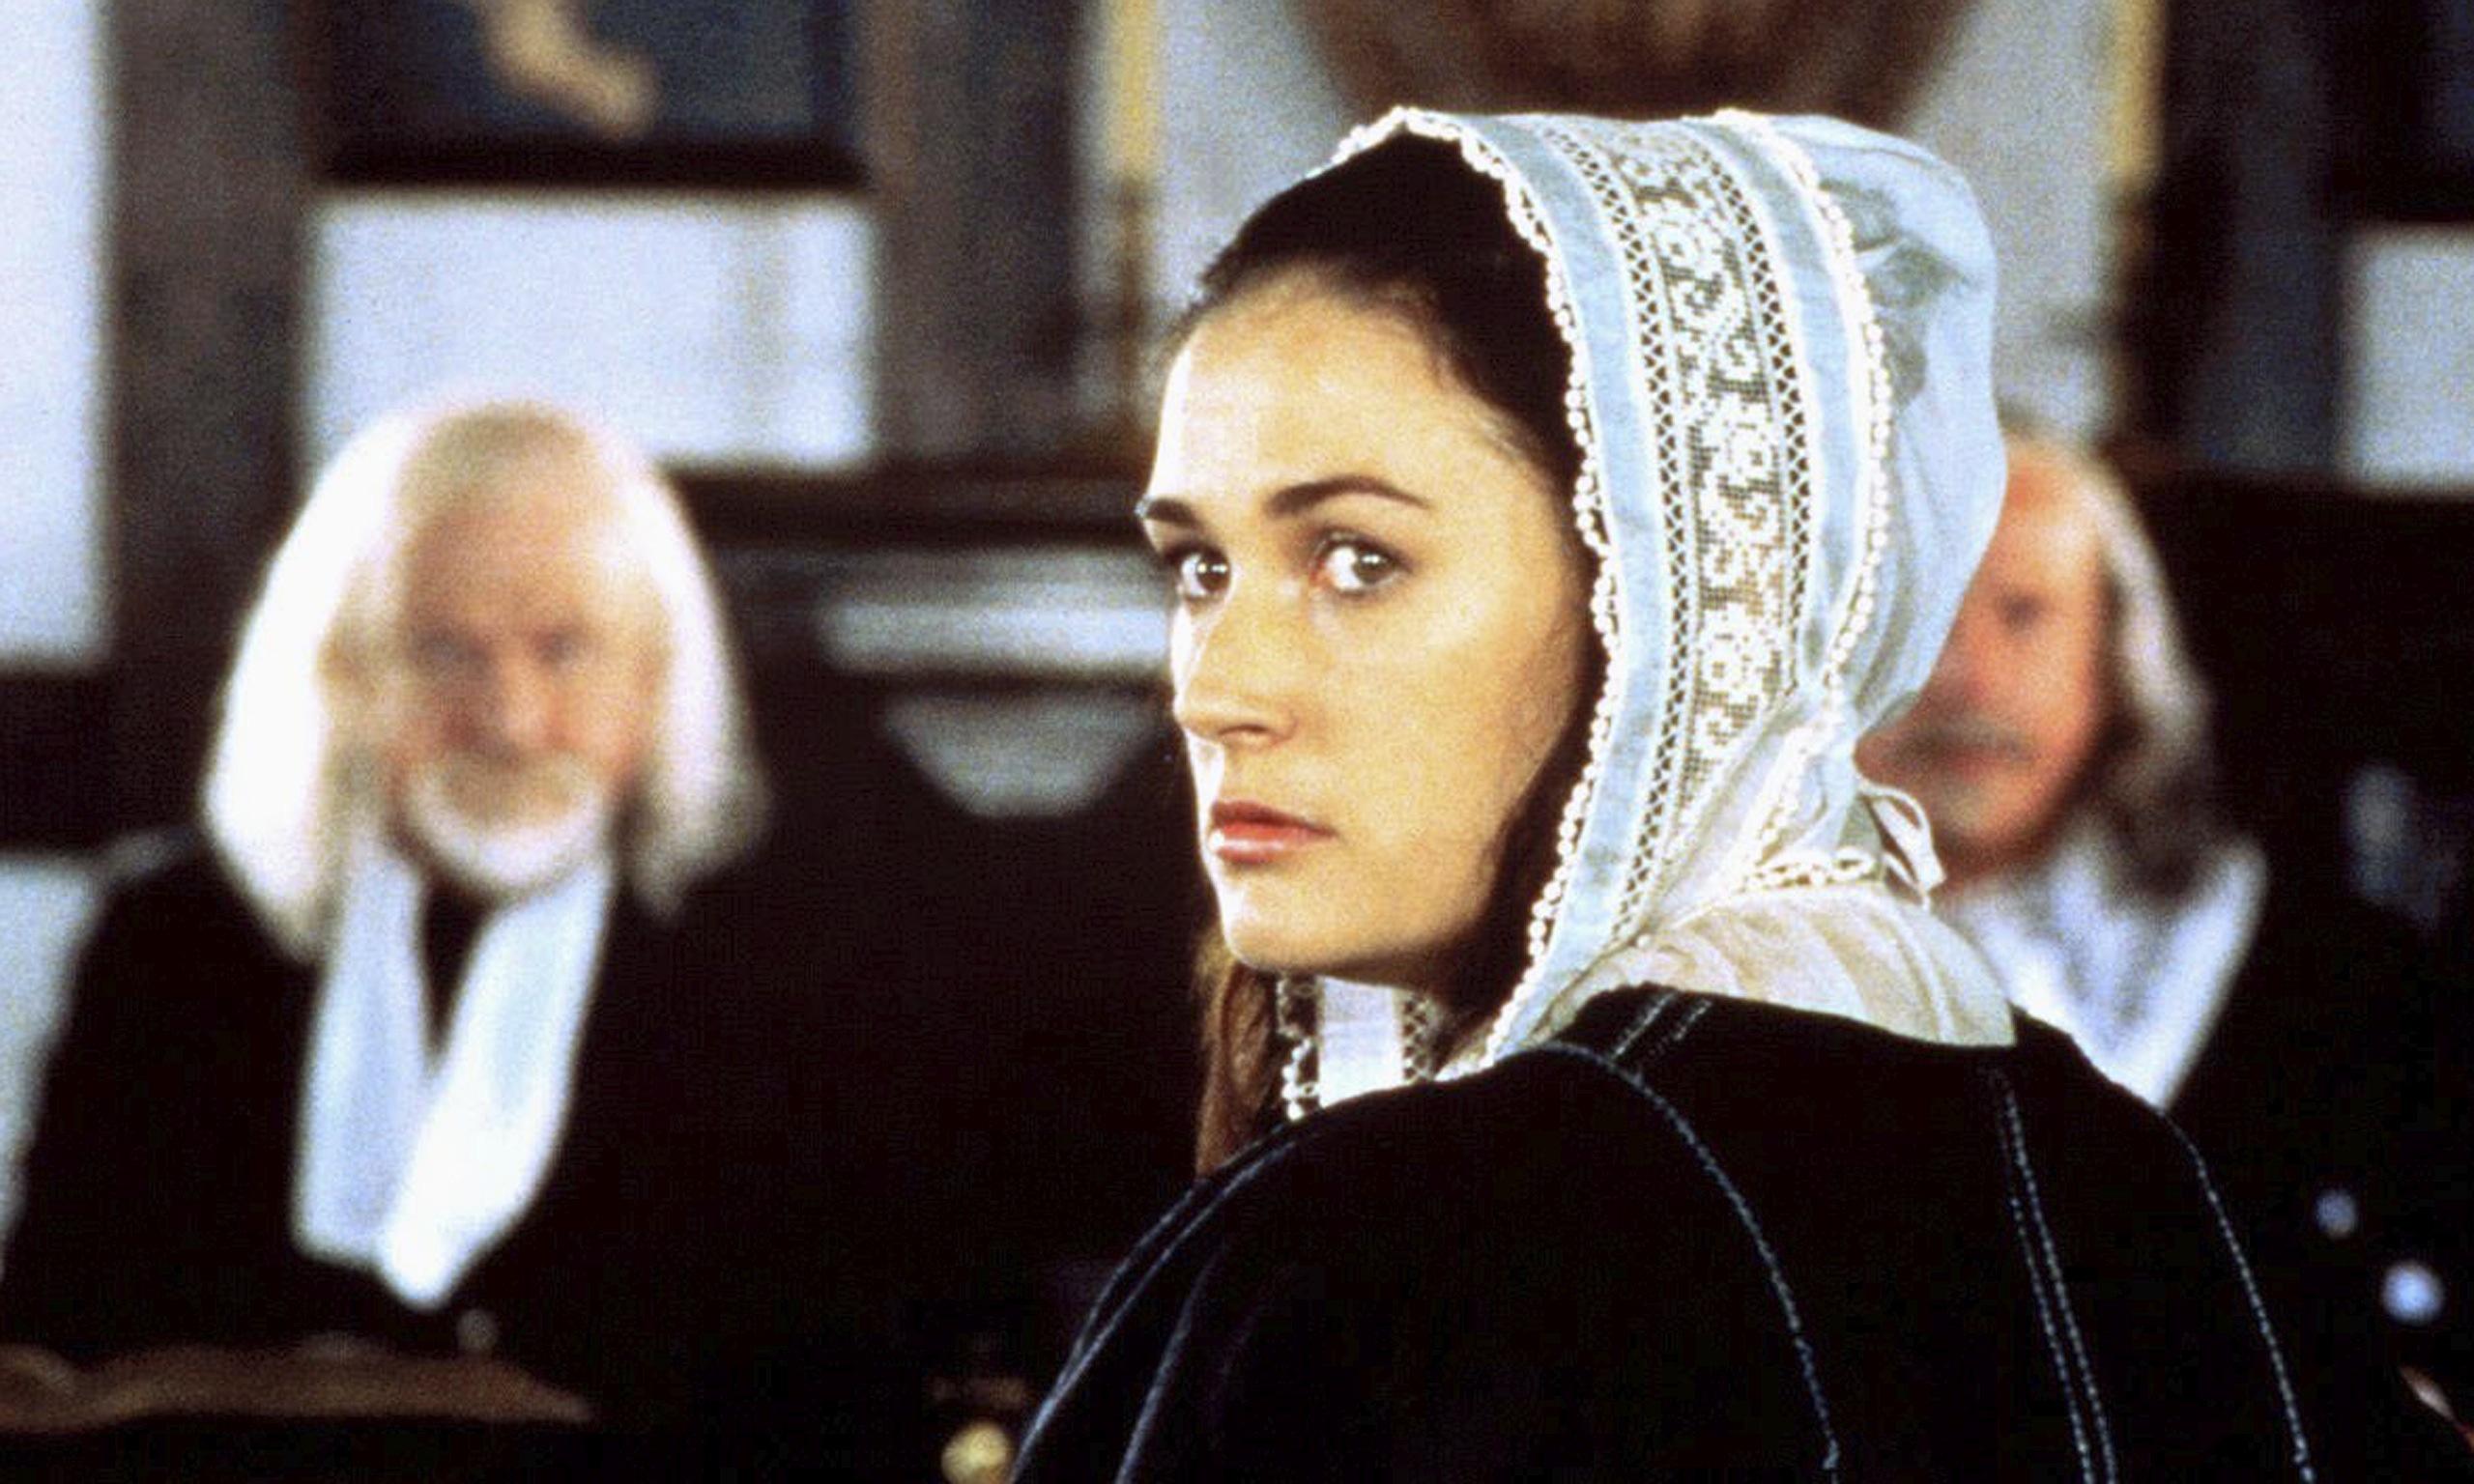 Rambling Thursday Movie Picks Adaptations of Classic Literature